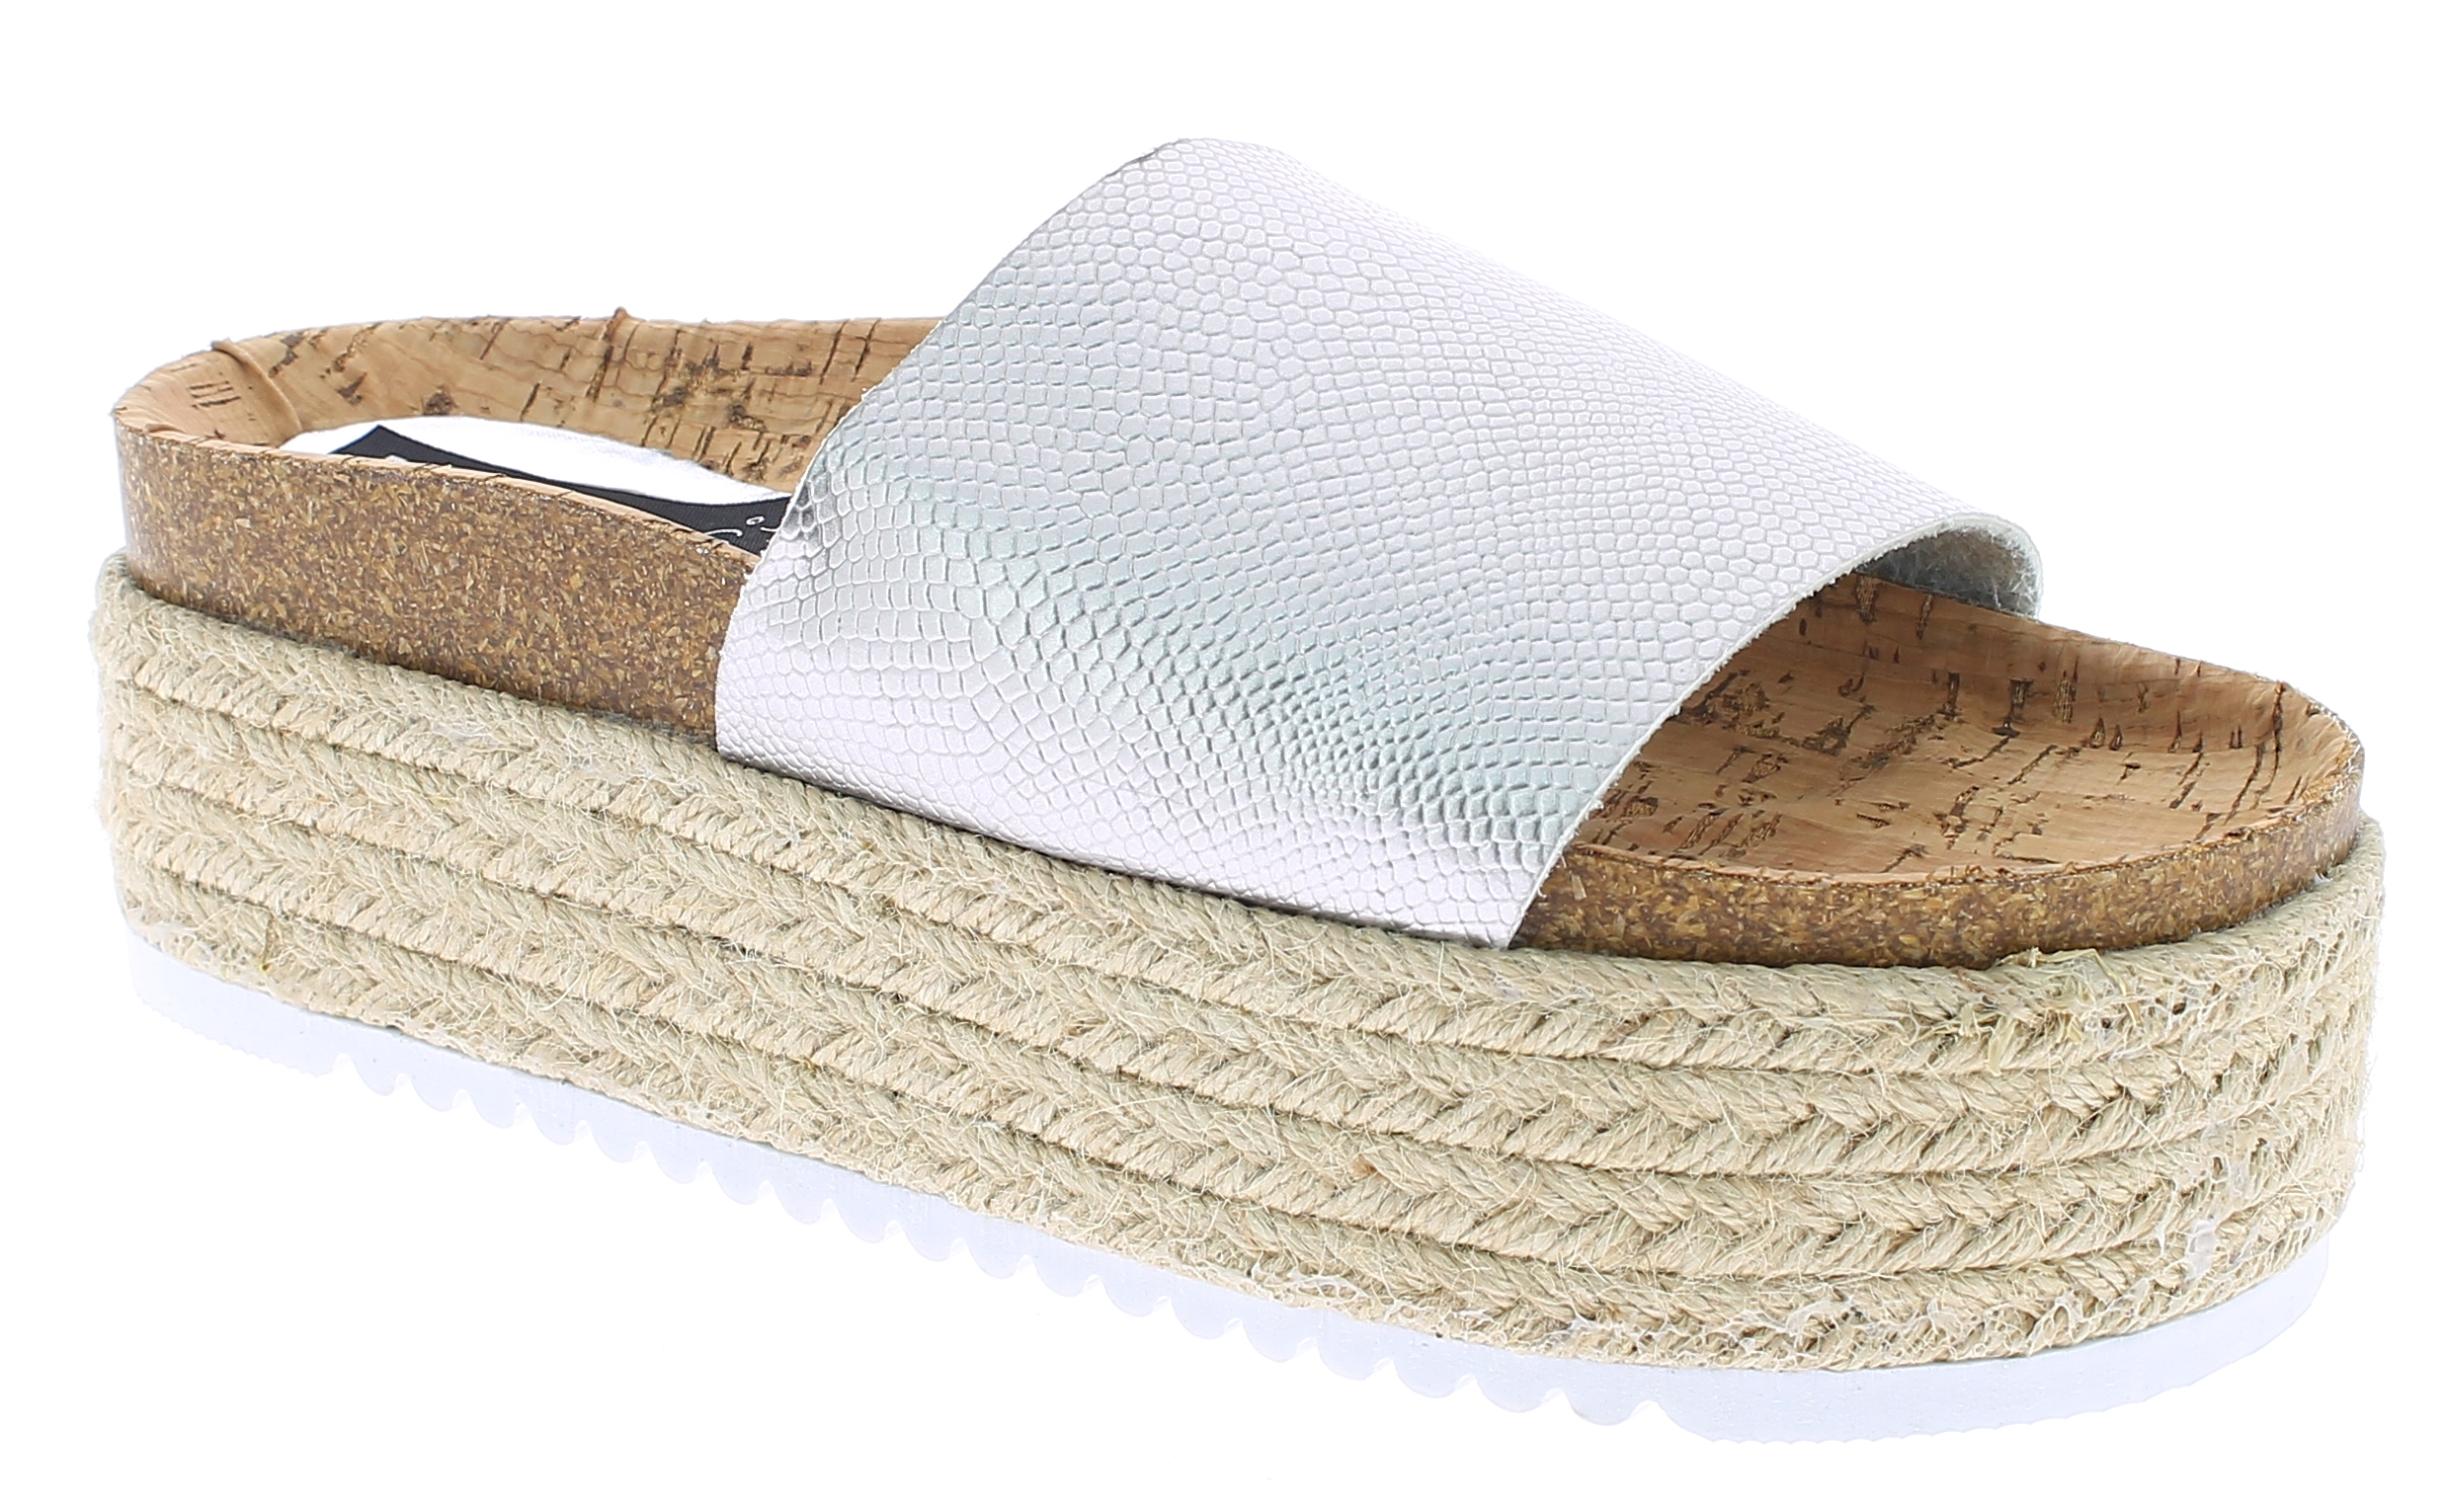 IQSHOES Γυναικεία Πλατφόρμα 1GG17075 Ασημί - IqShoes - 1GG-17075 SILVER-silver-3 παπούτσια  γυναικείες πλατφόρμες